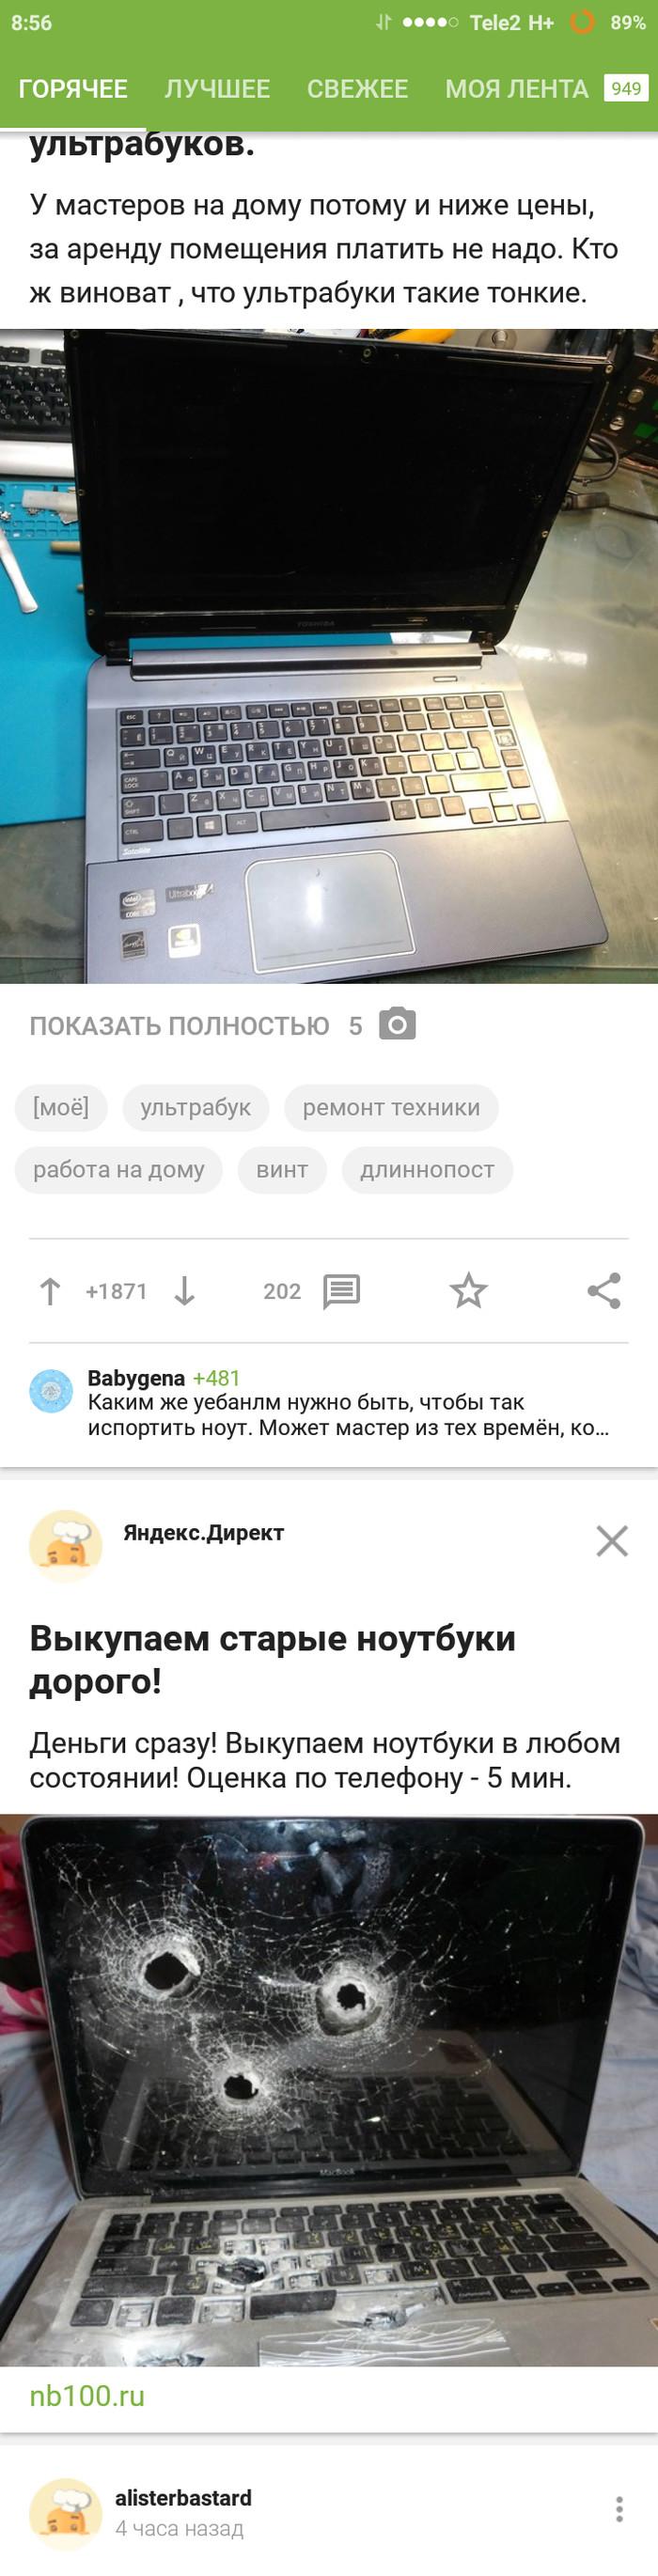 Совпадение? Не думаю... Ноутбук, Совпадение, Яндекс директ, Длиннопост